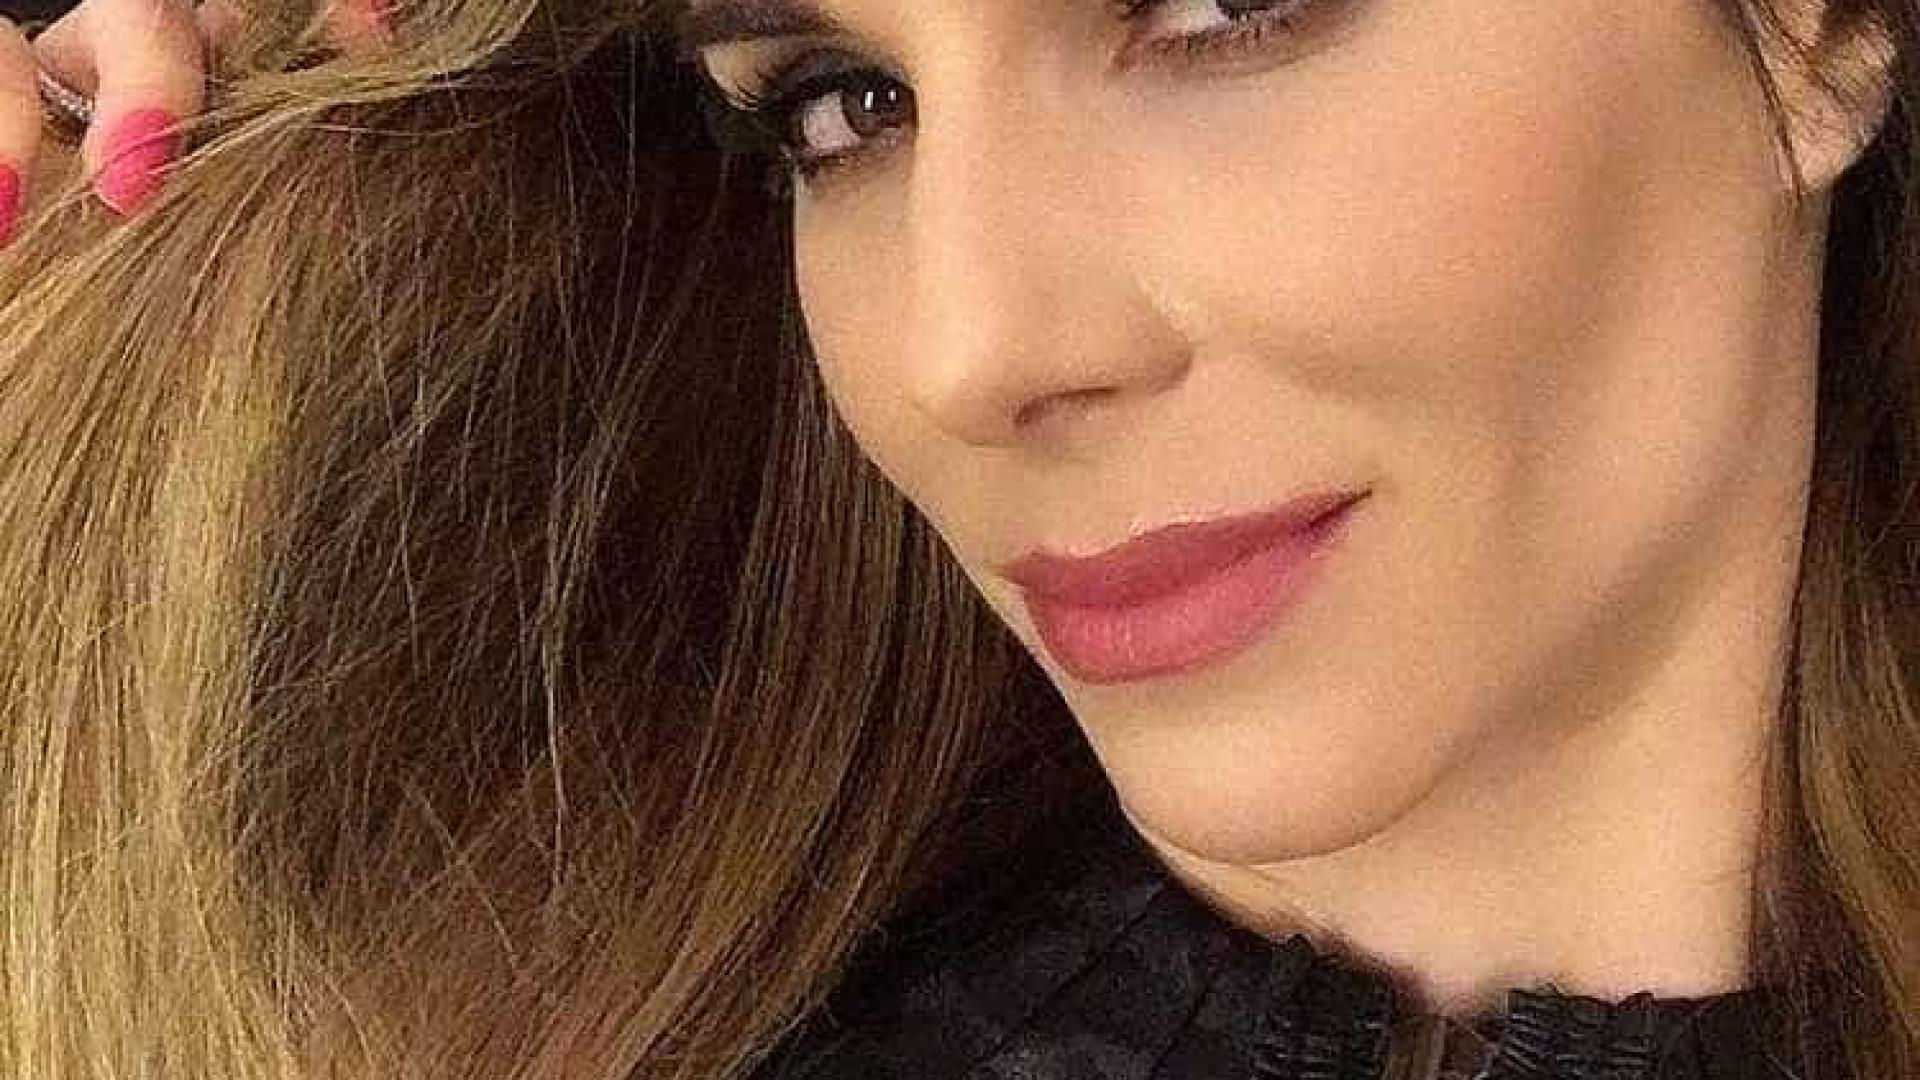 Ana Furtado tenta evitar queda de cabelos com quimioterapia